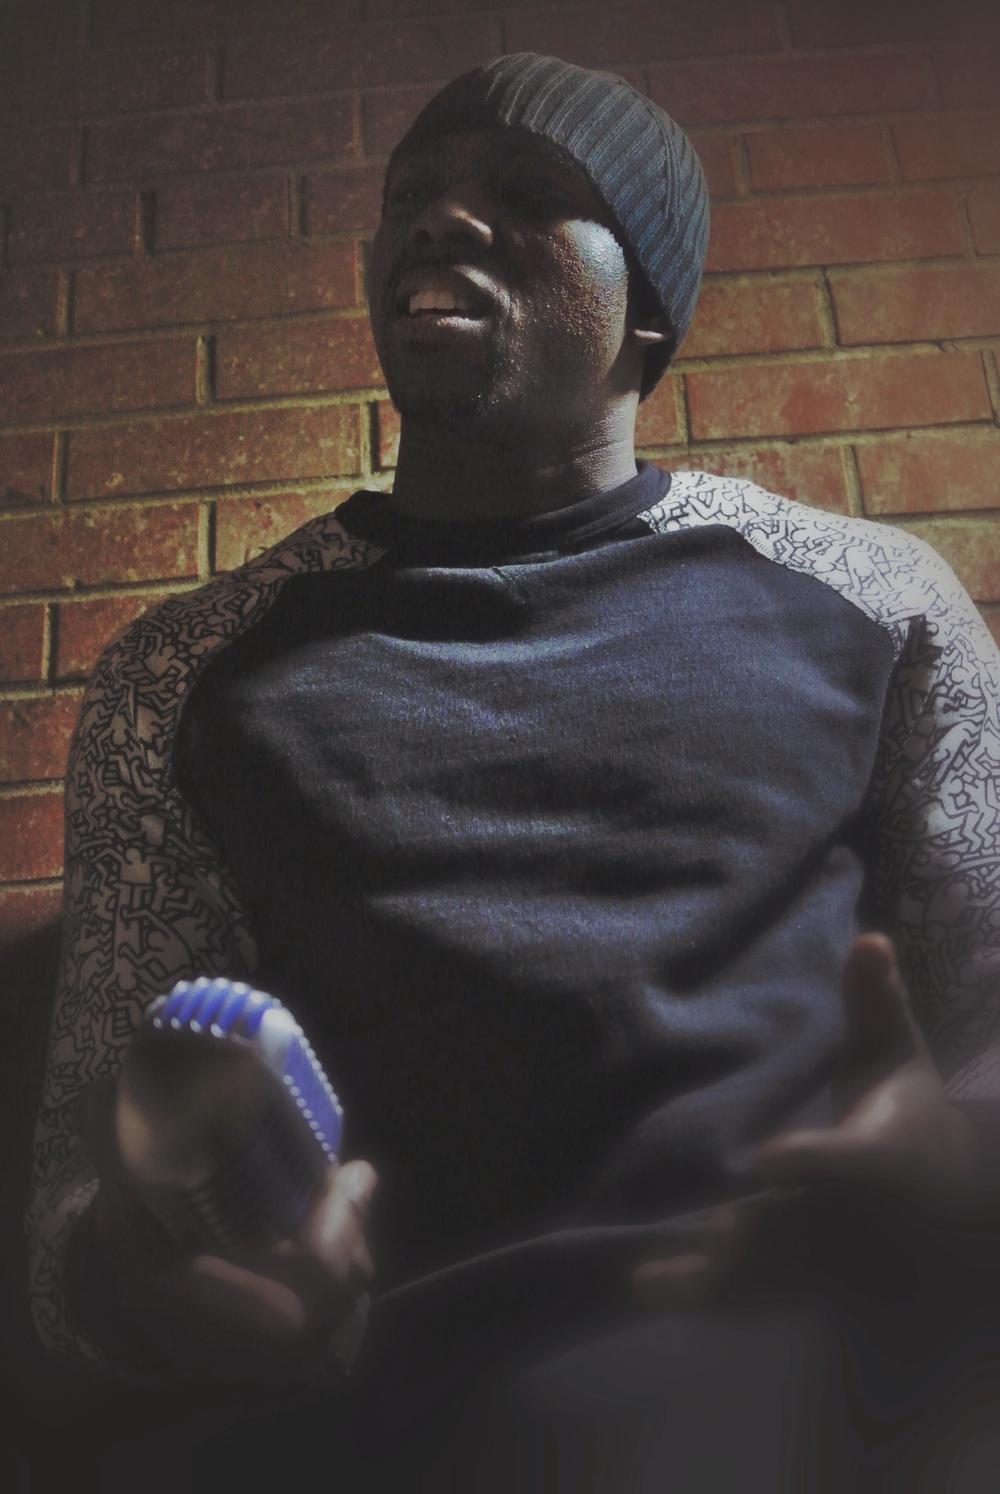 Vocalist and audio engineer  Twiggo